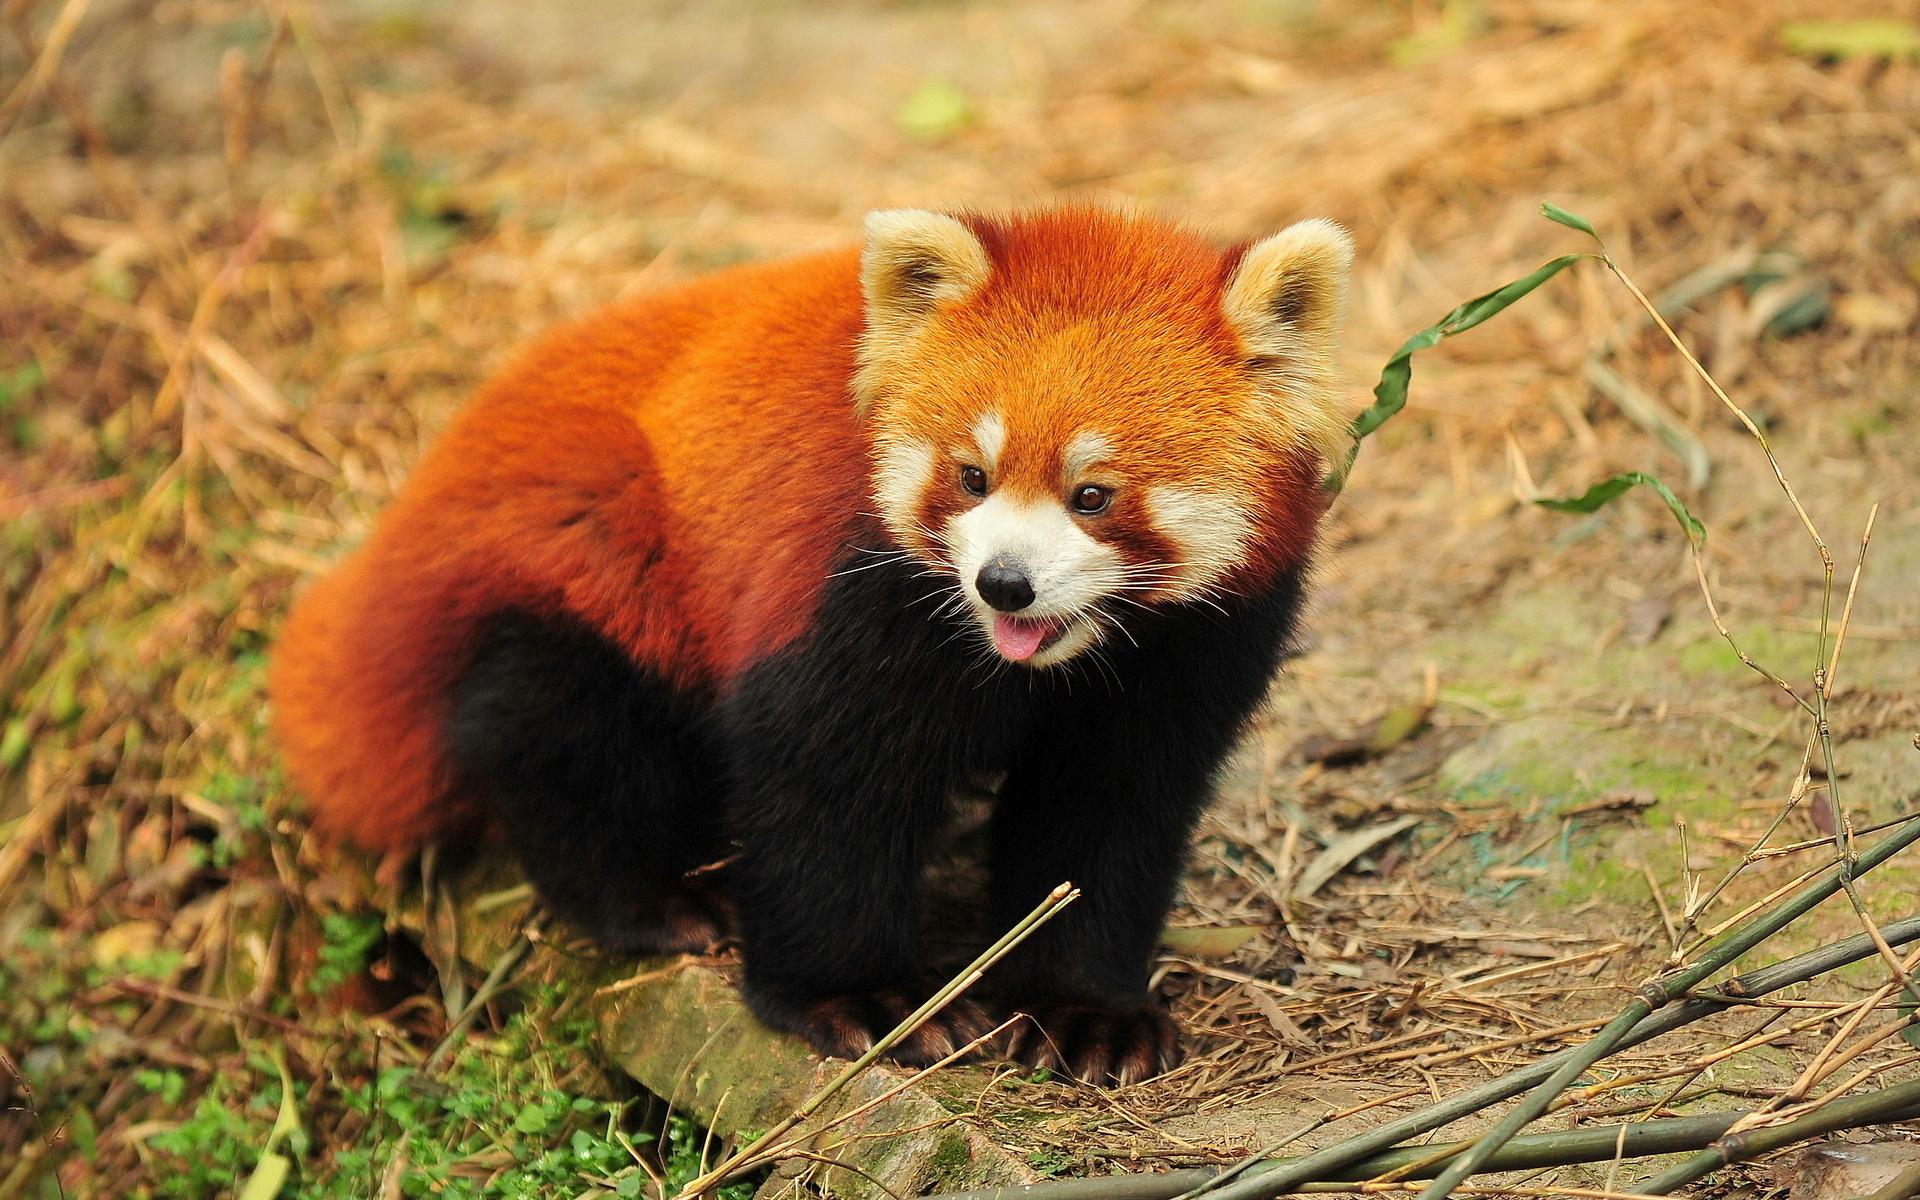 Cute Animated Wallpapers Hd 28 Wonderful Hd Red Panda Wallpapers